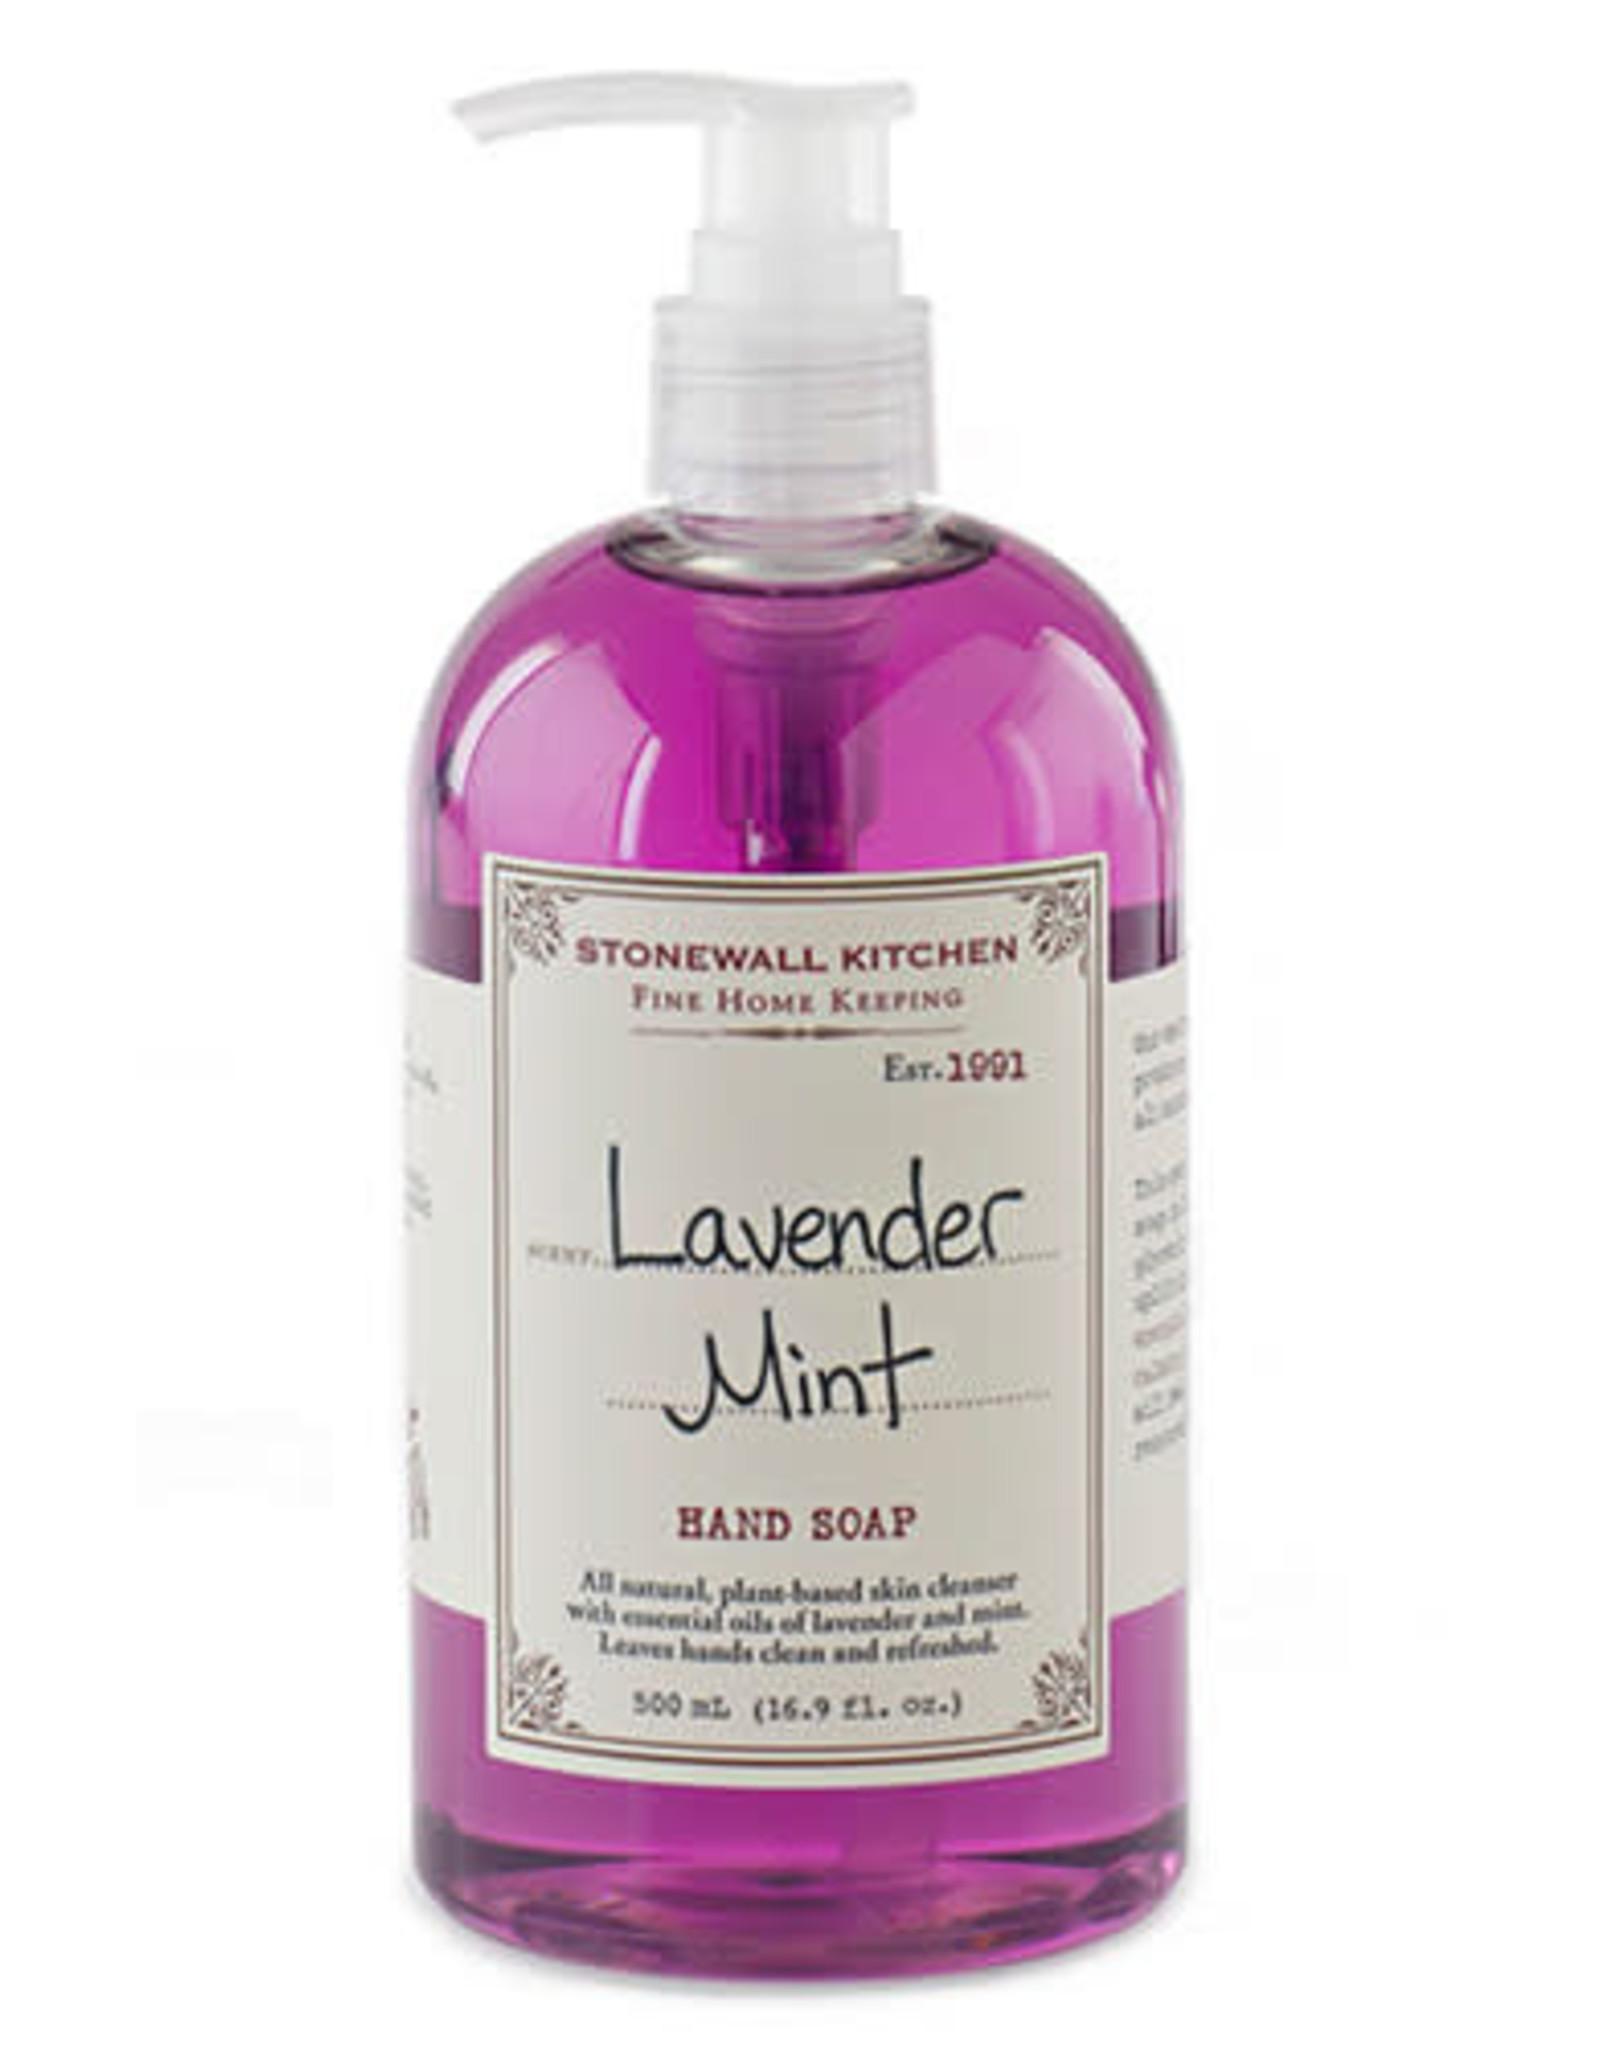 Stonewall Kitchen Lavender Mint Hand Soap